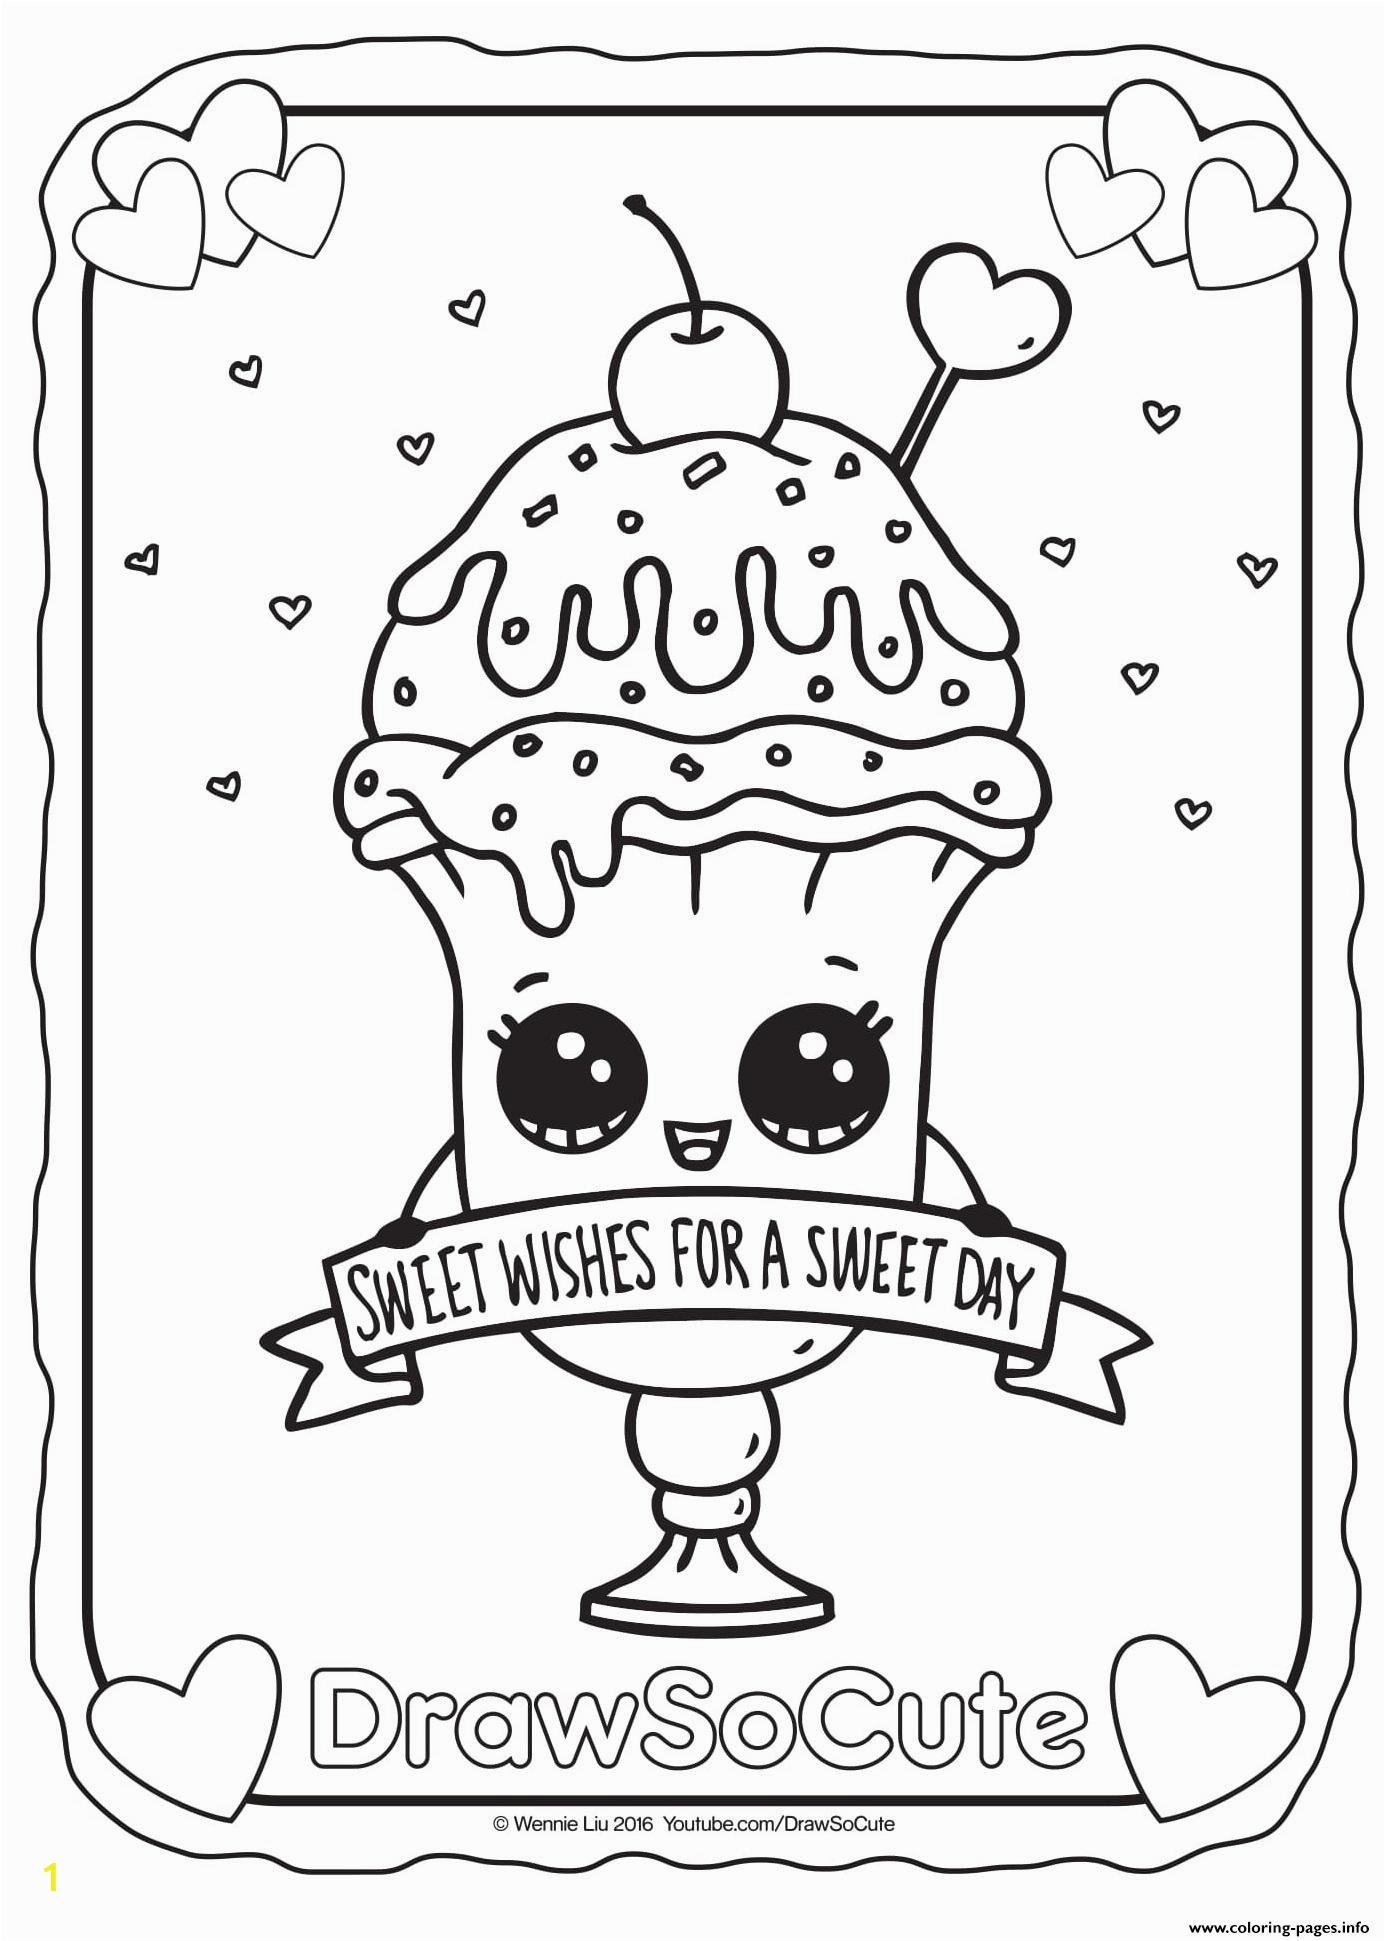 naturalod coloring free pictures to printr kids printable cornucopia fruit cute